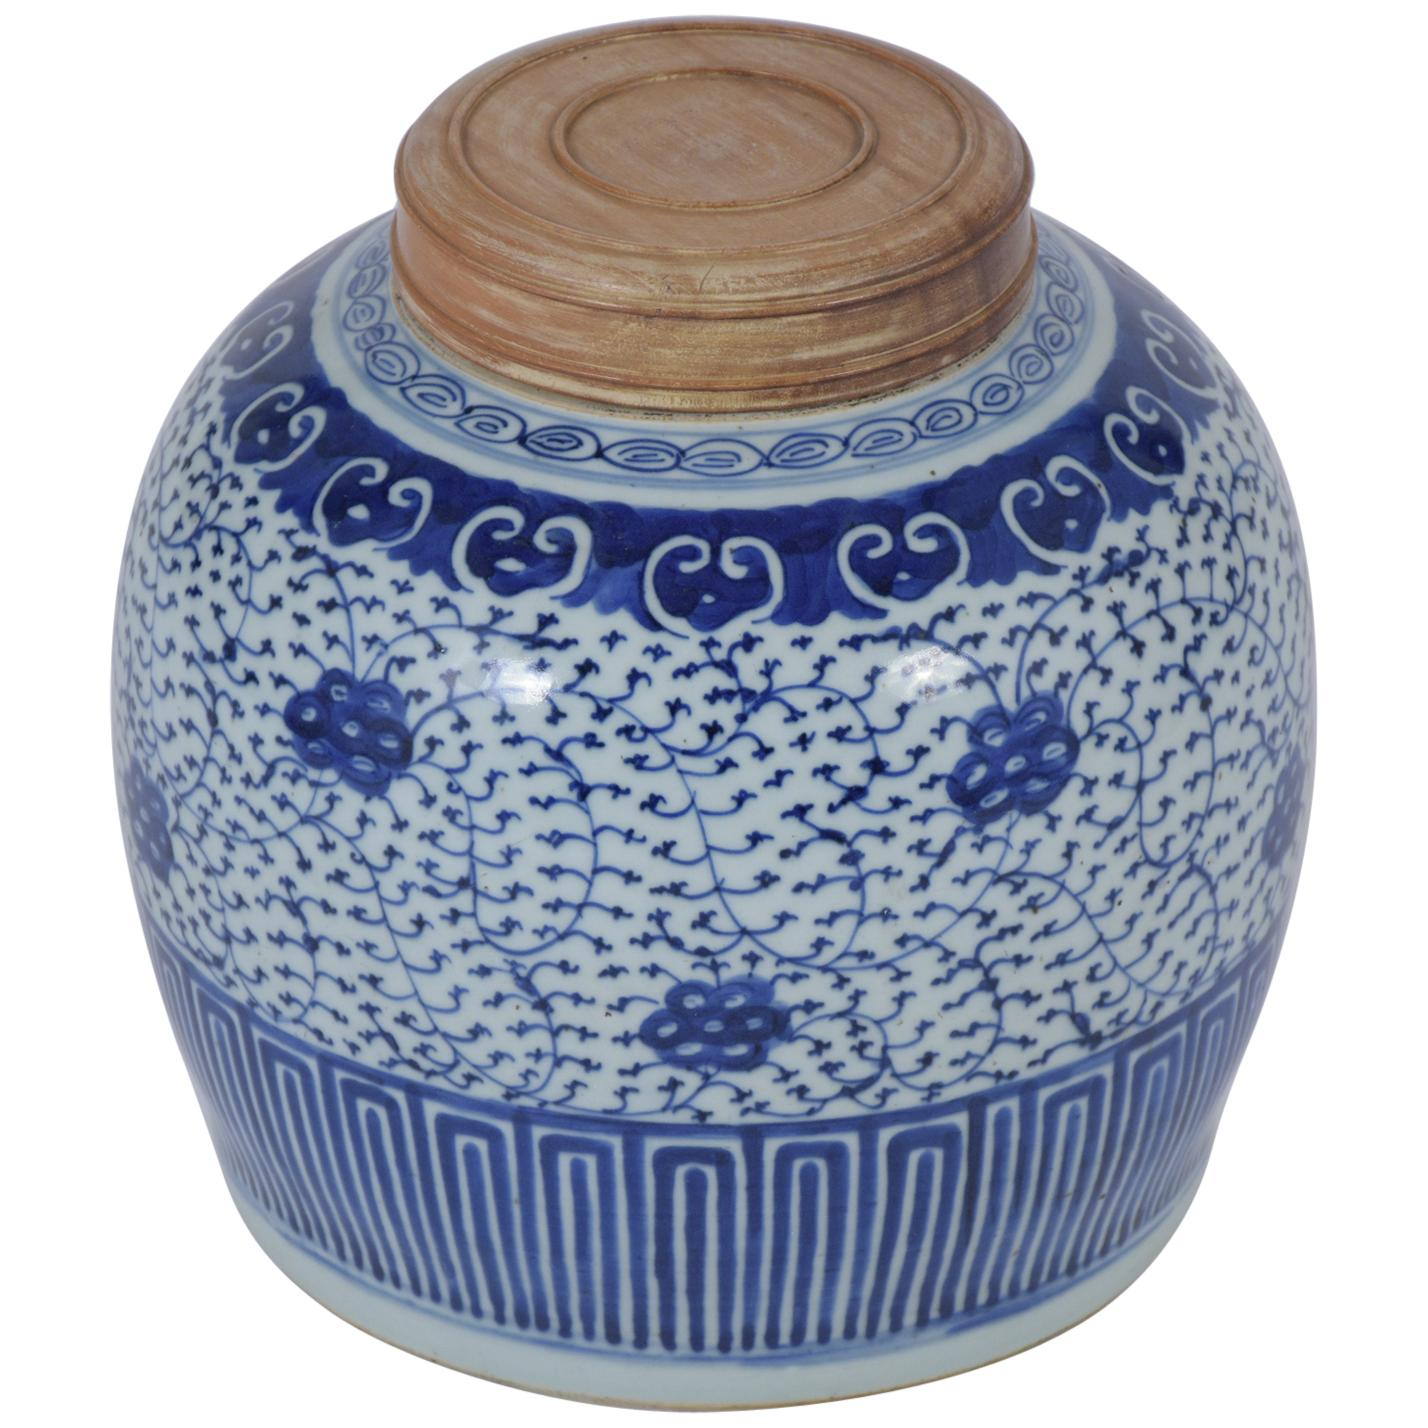 Antique Chinese White & Blue Porcelain Jar